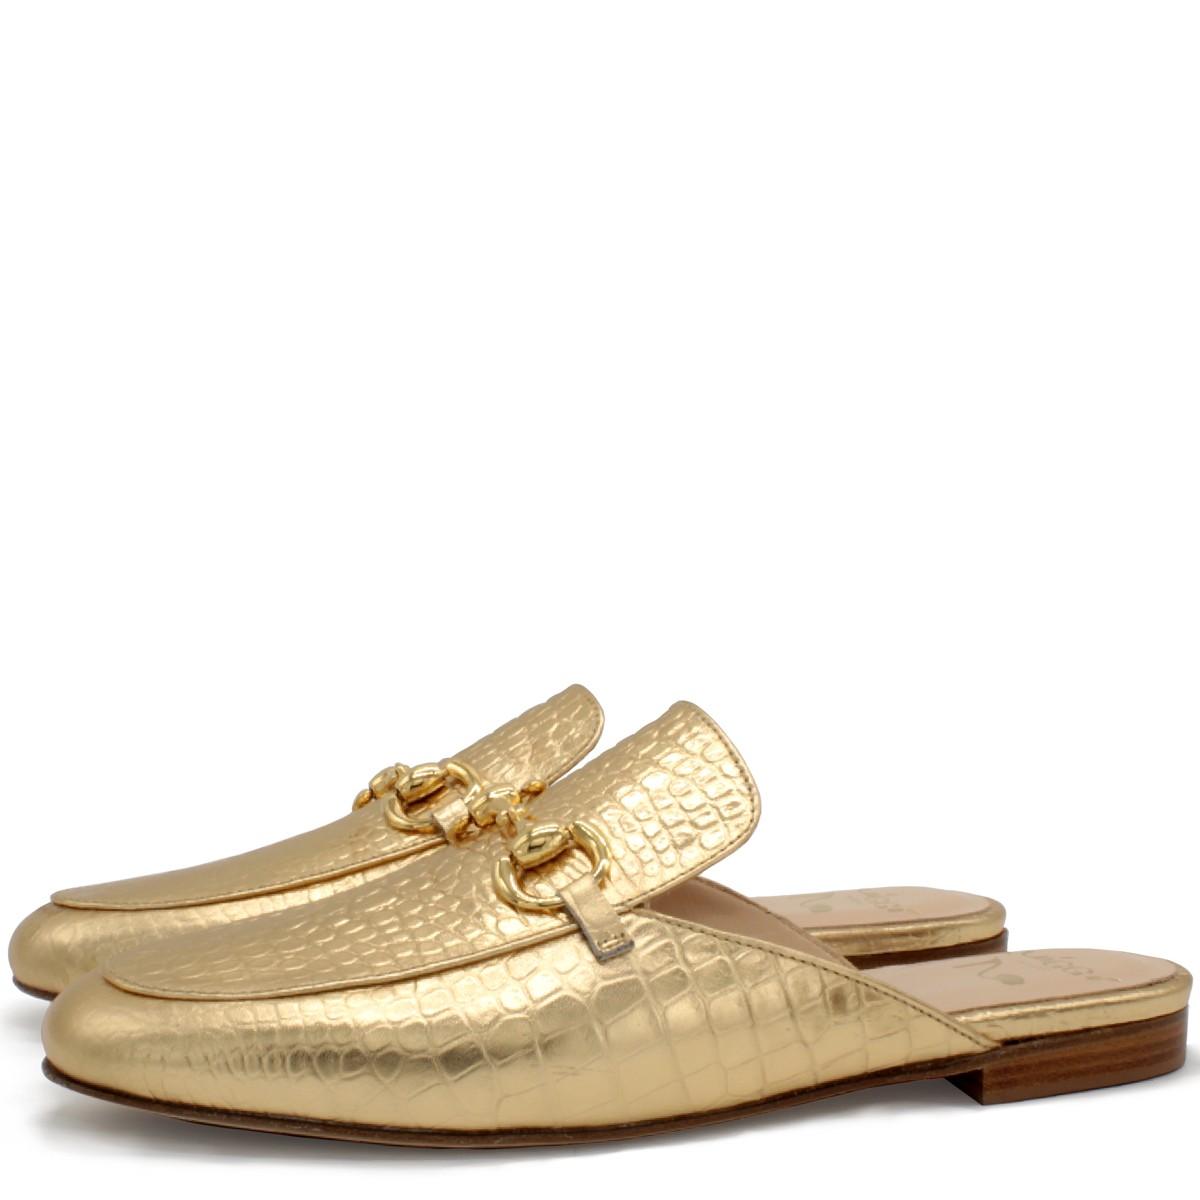 GOLD FLAT MULES